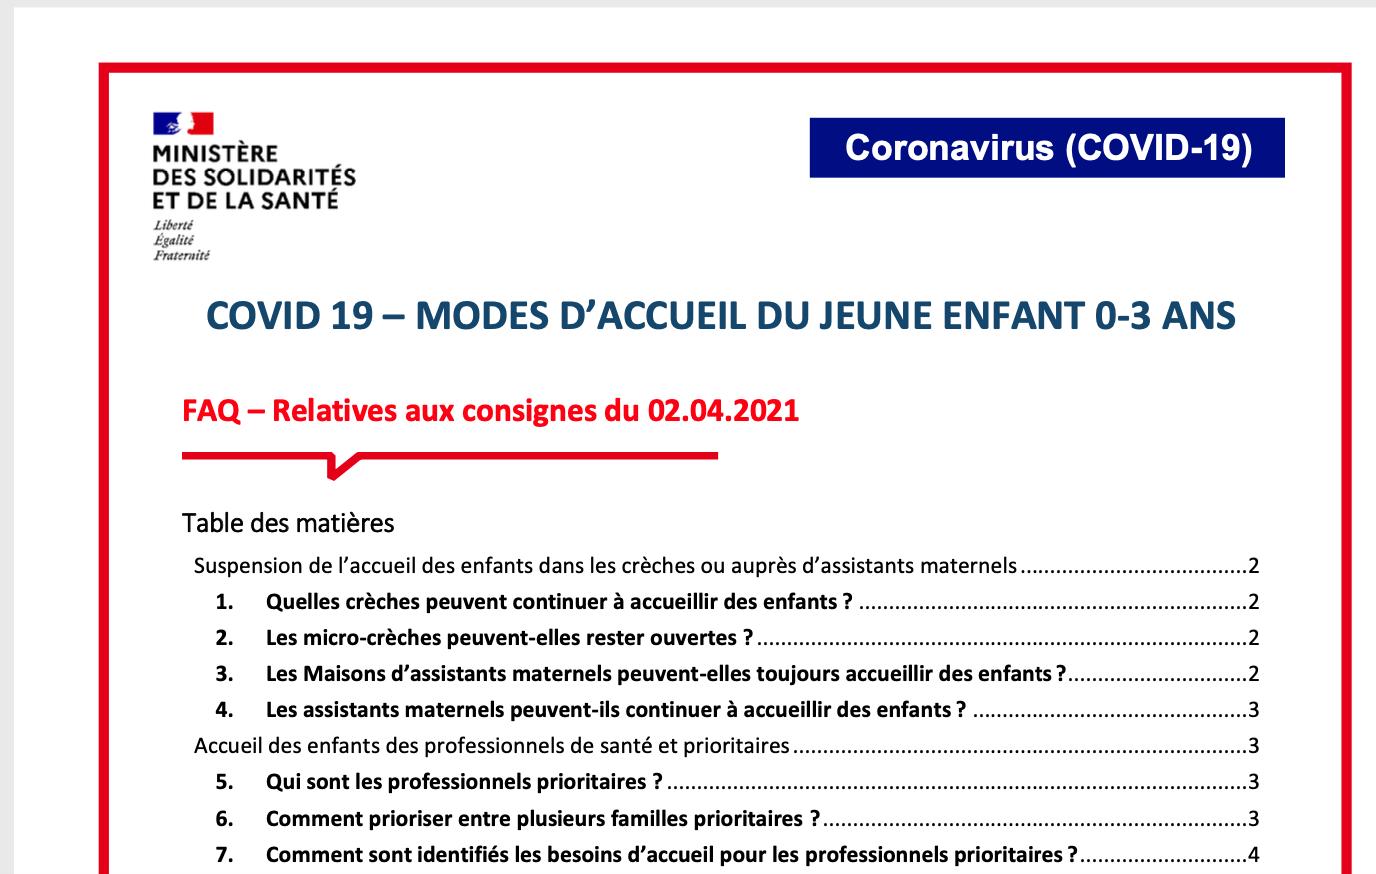 Covid 19 -modes d